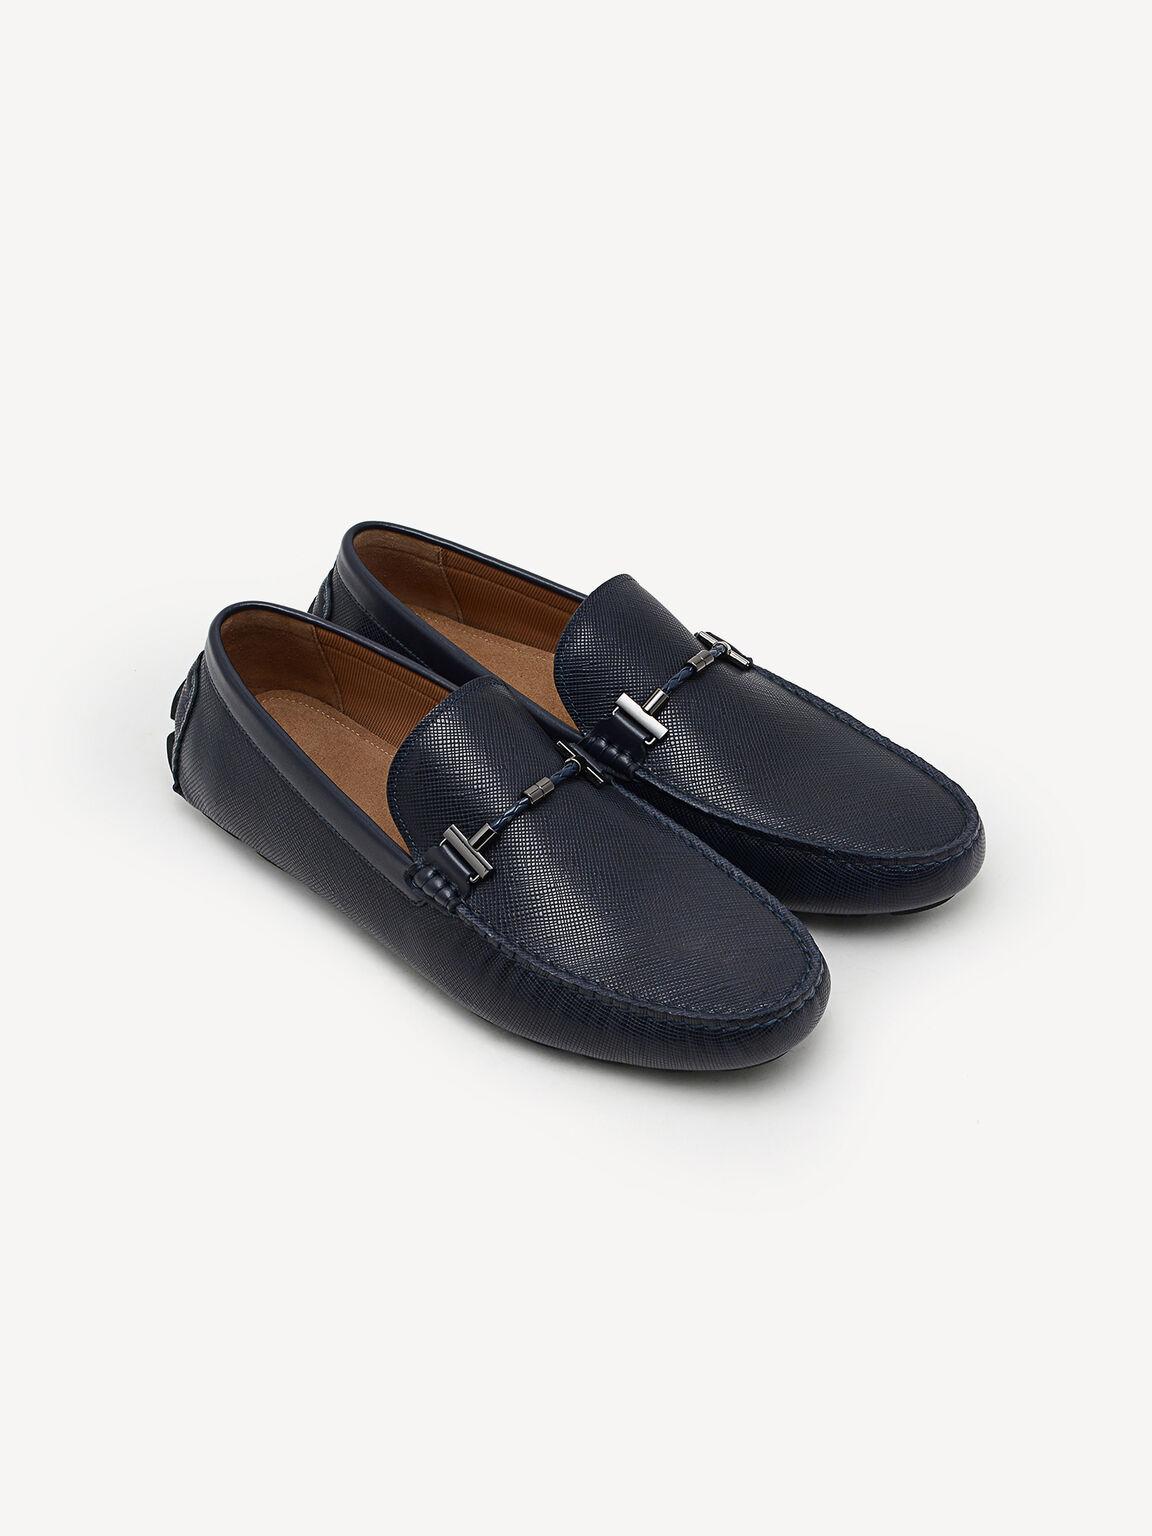 Leather Moccasins, Navy, hi-res